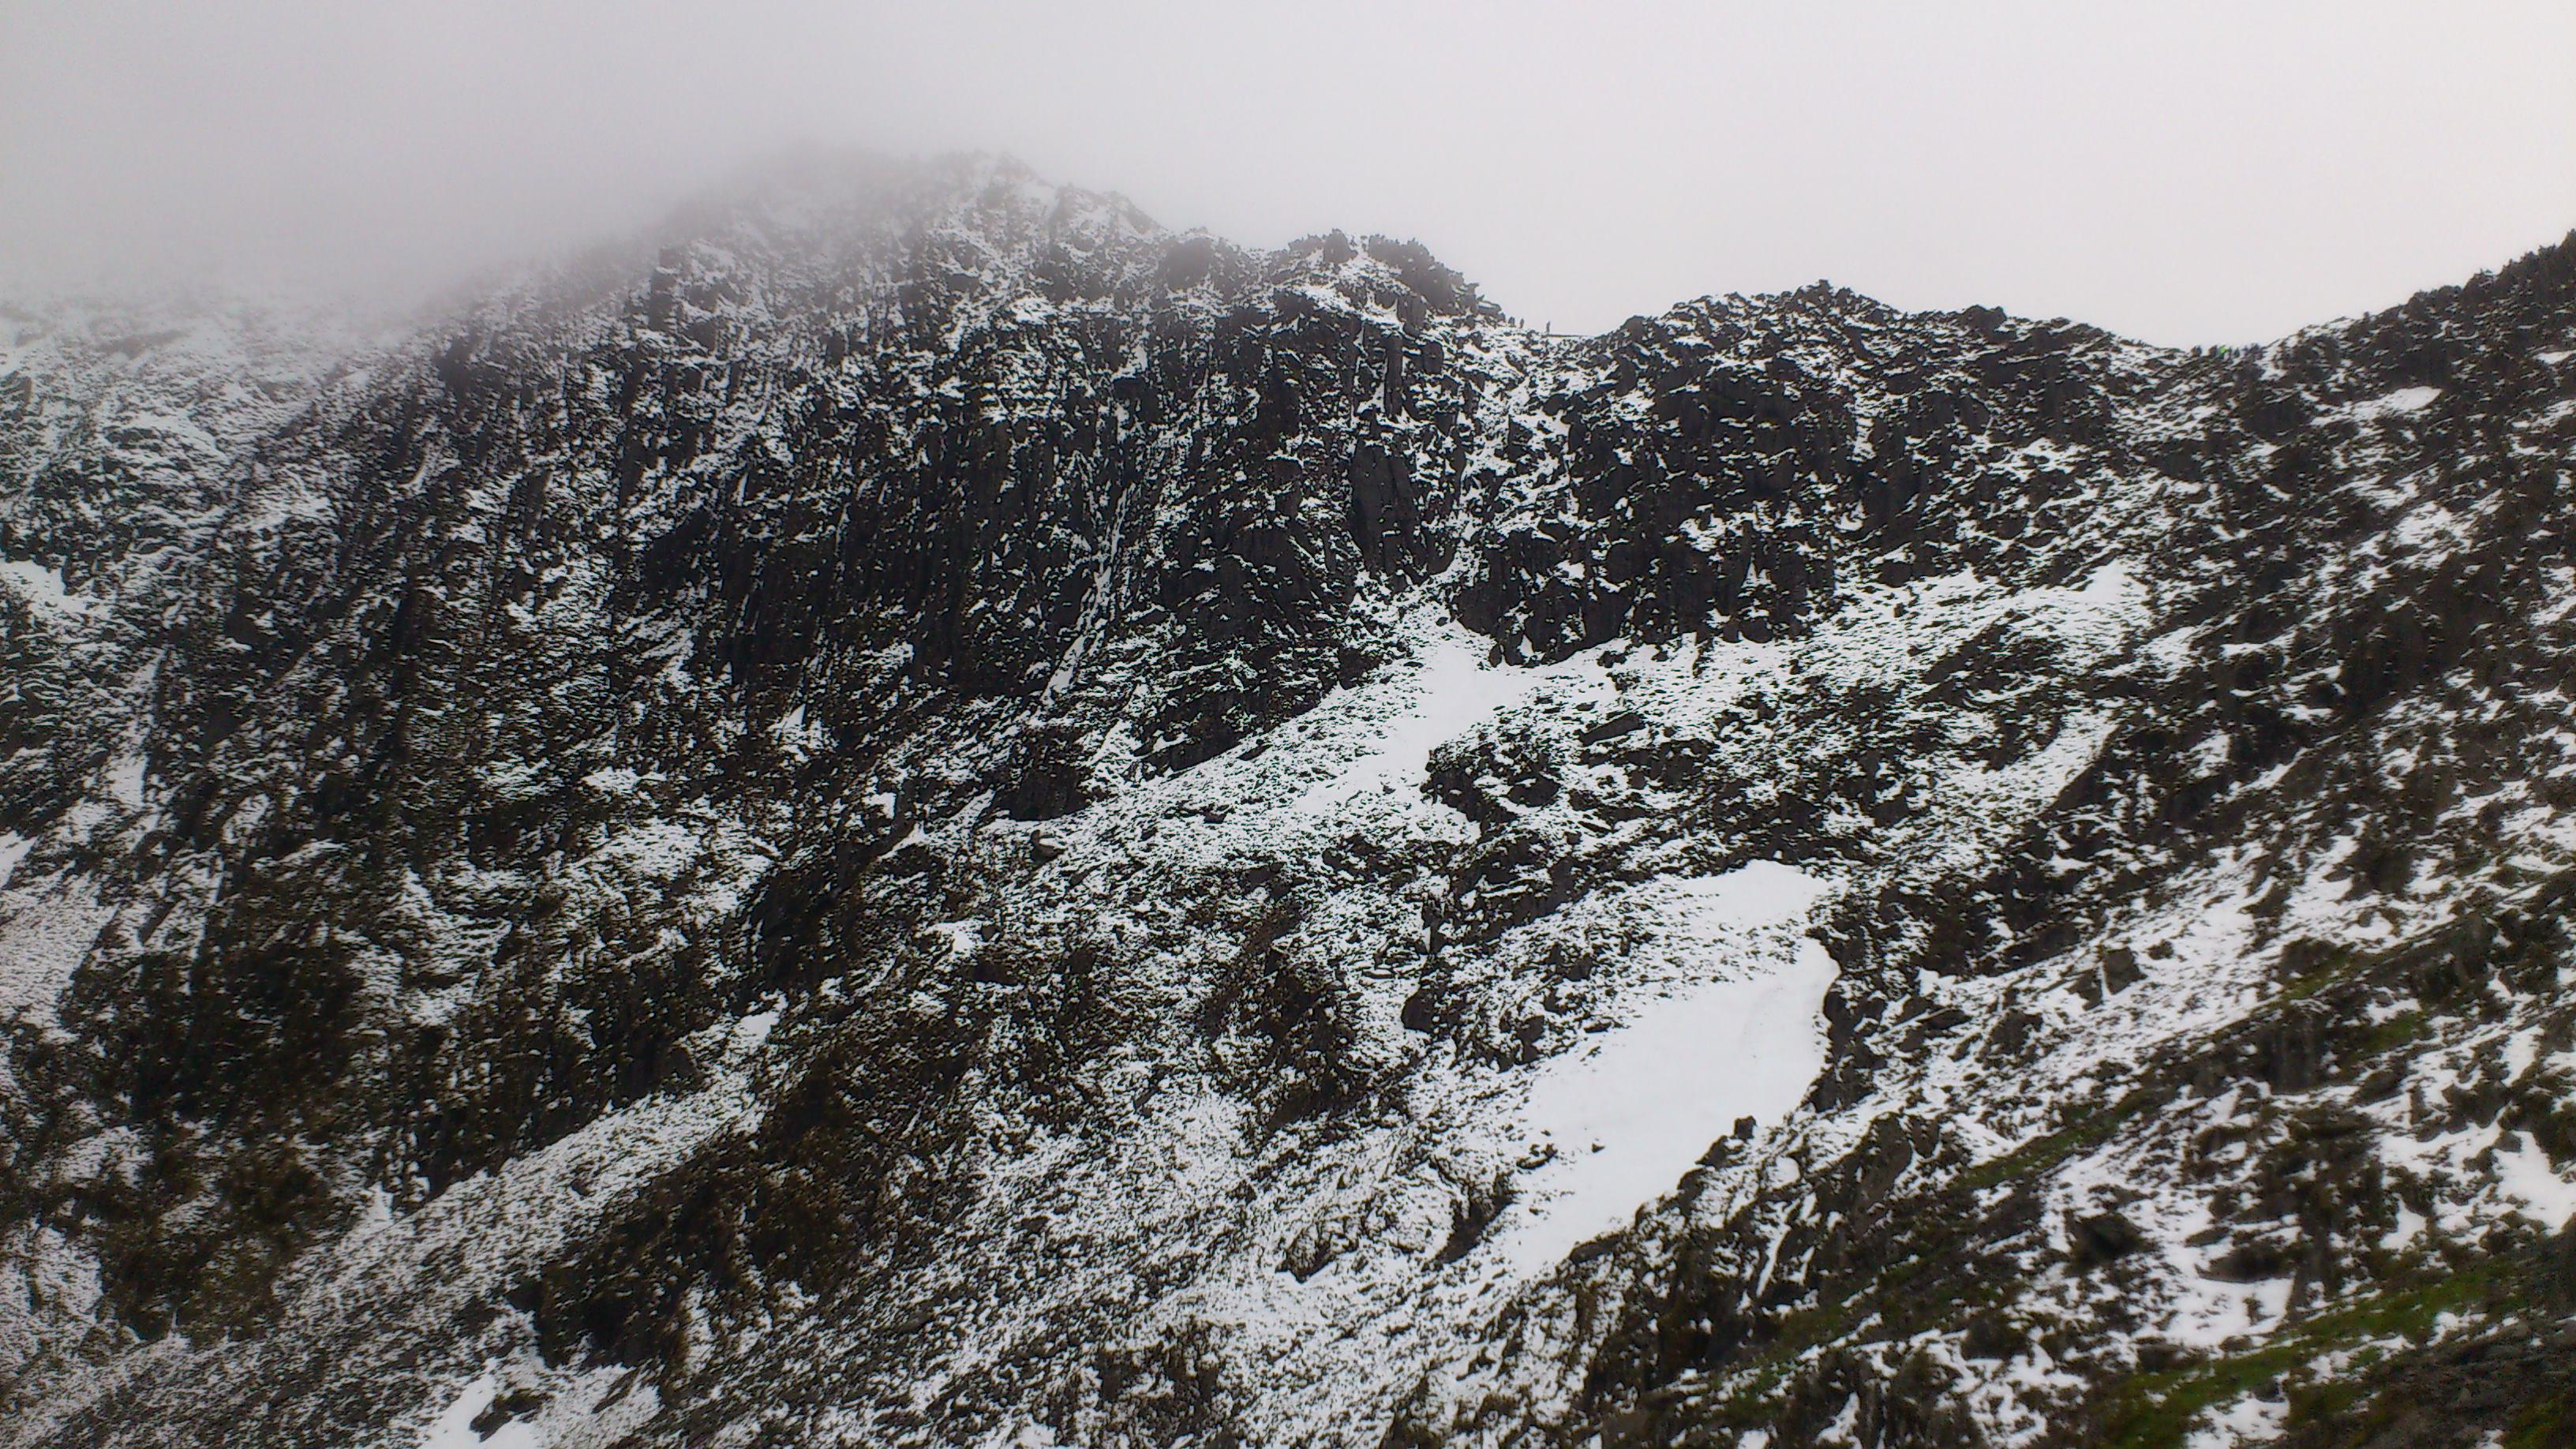 Snowdon pyg track April 2012